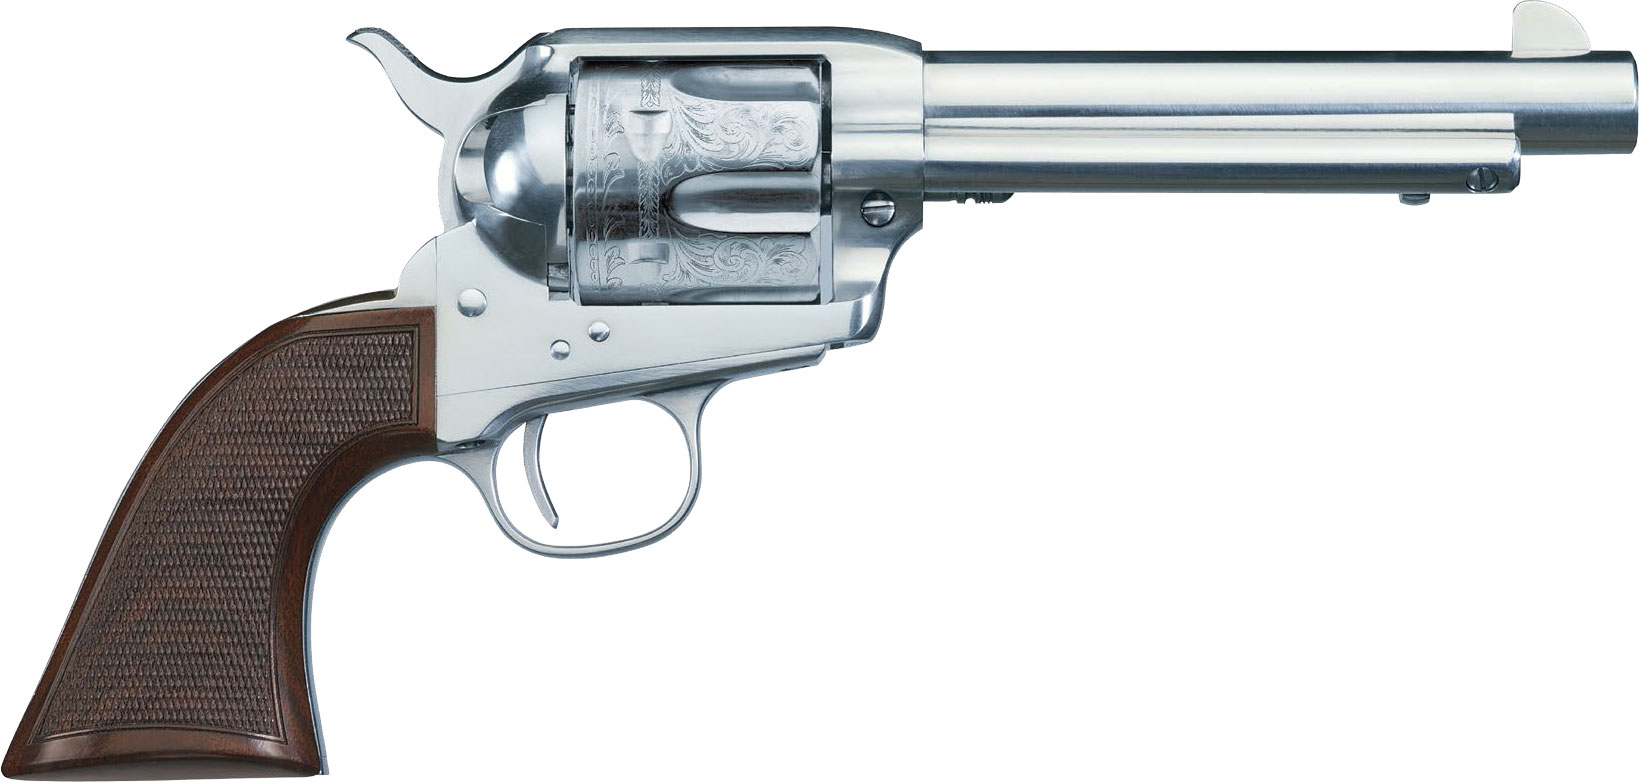 "Manufacturer Coupons Mail >> Uberti 1873 El Patron Belleza Limited Edition Revolver 345090, 45 Colt, 5.5"", Walnut Grip ..."